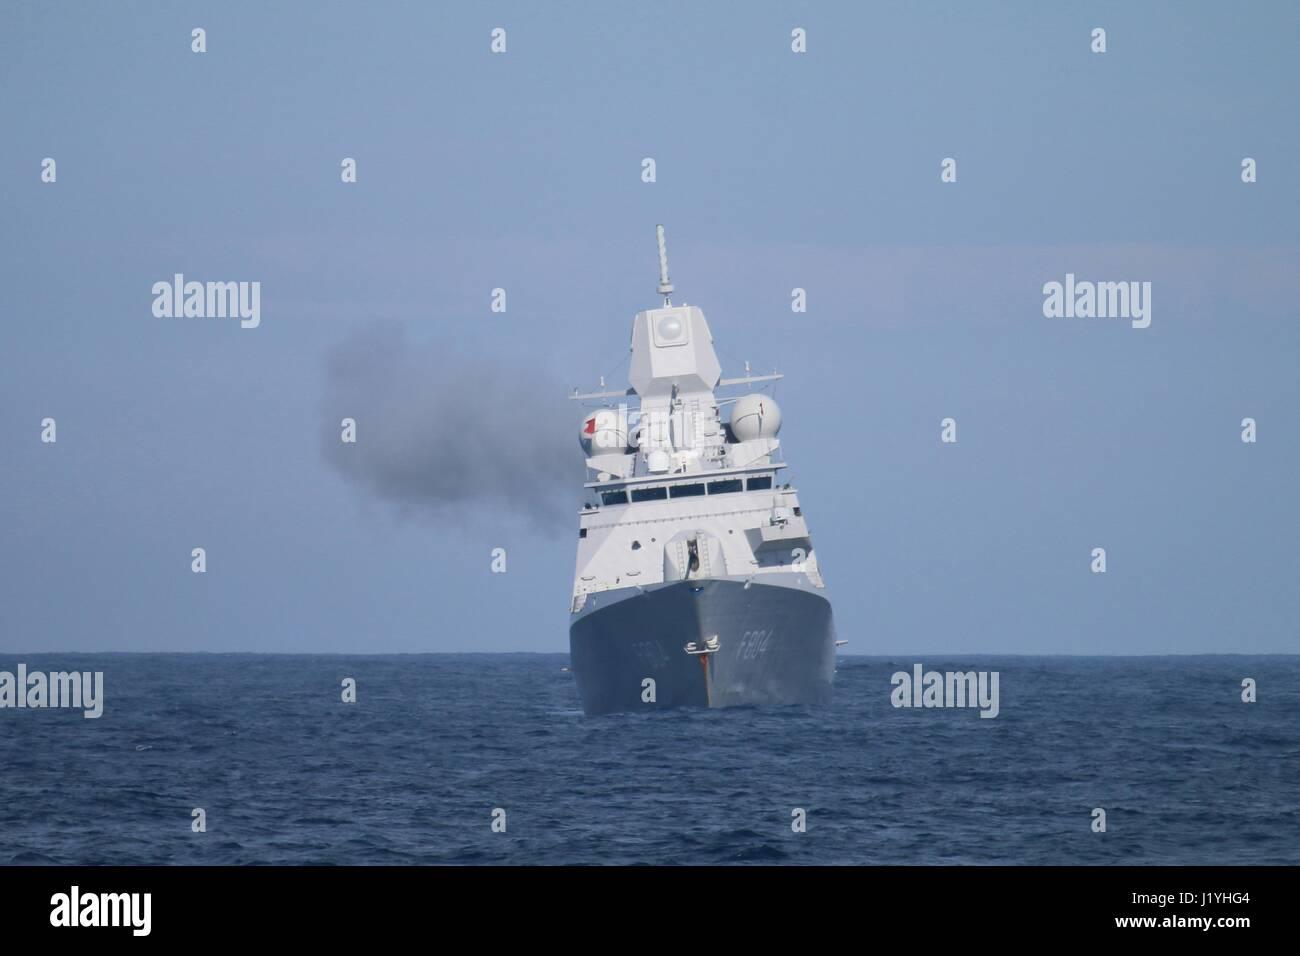 The Royal Netherlands Navy De Zeven Provincien-class frigate HNLMS De Ruyter conducts a live-fire gunnery exercise Stock Photo